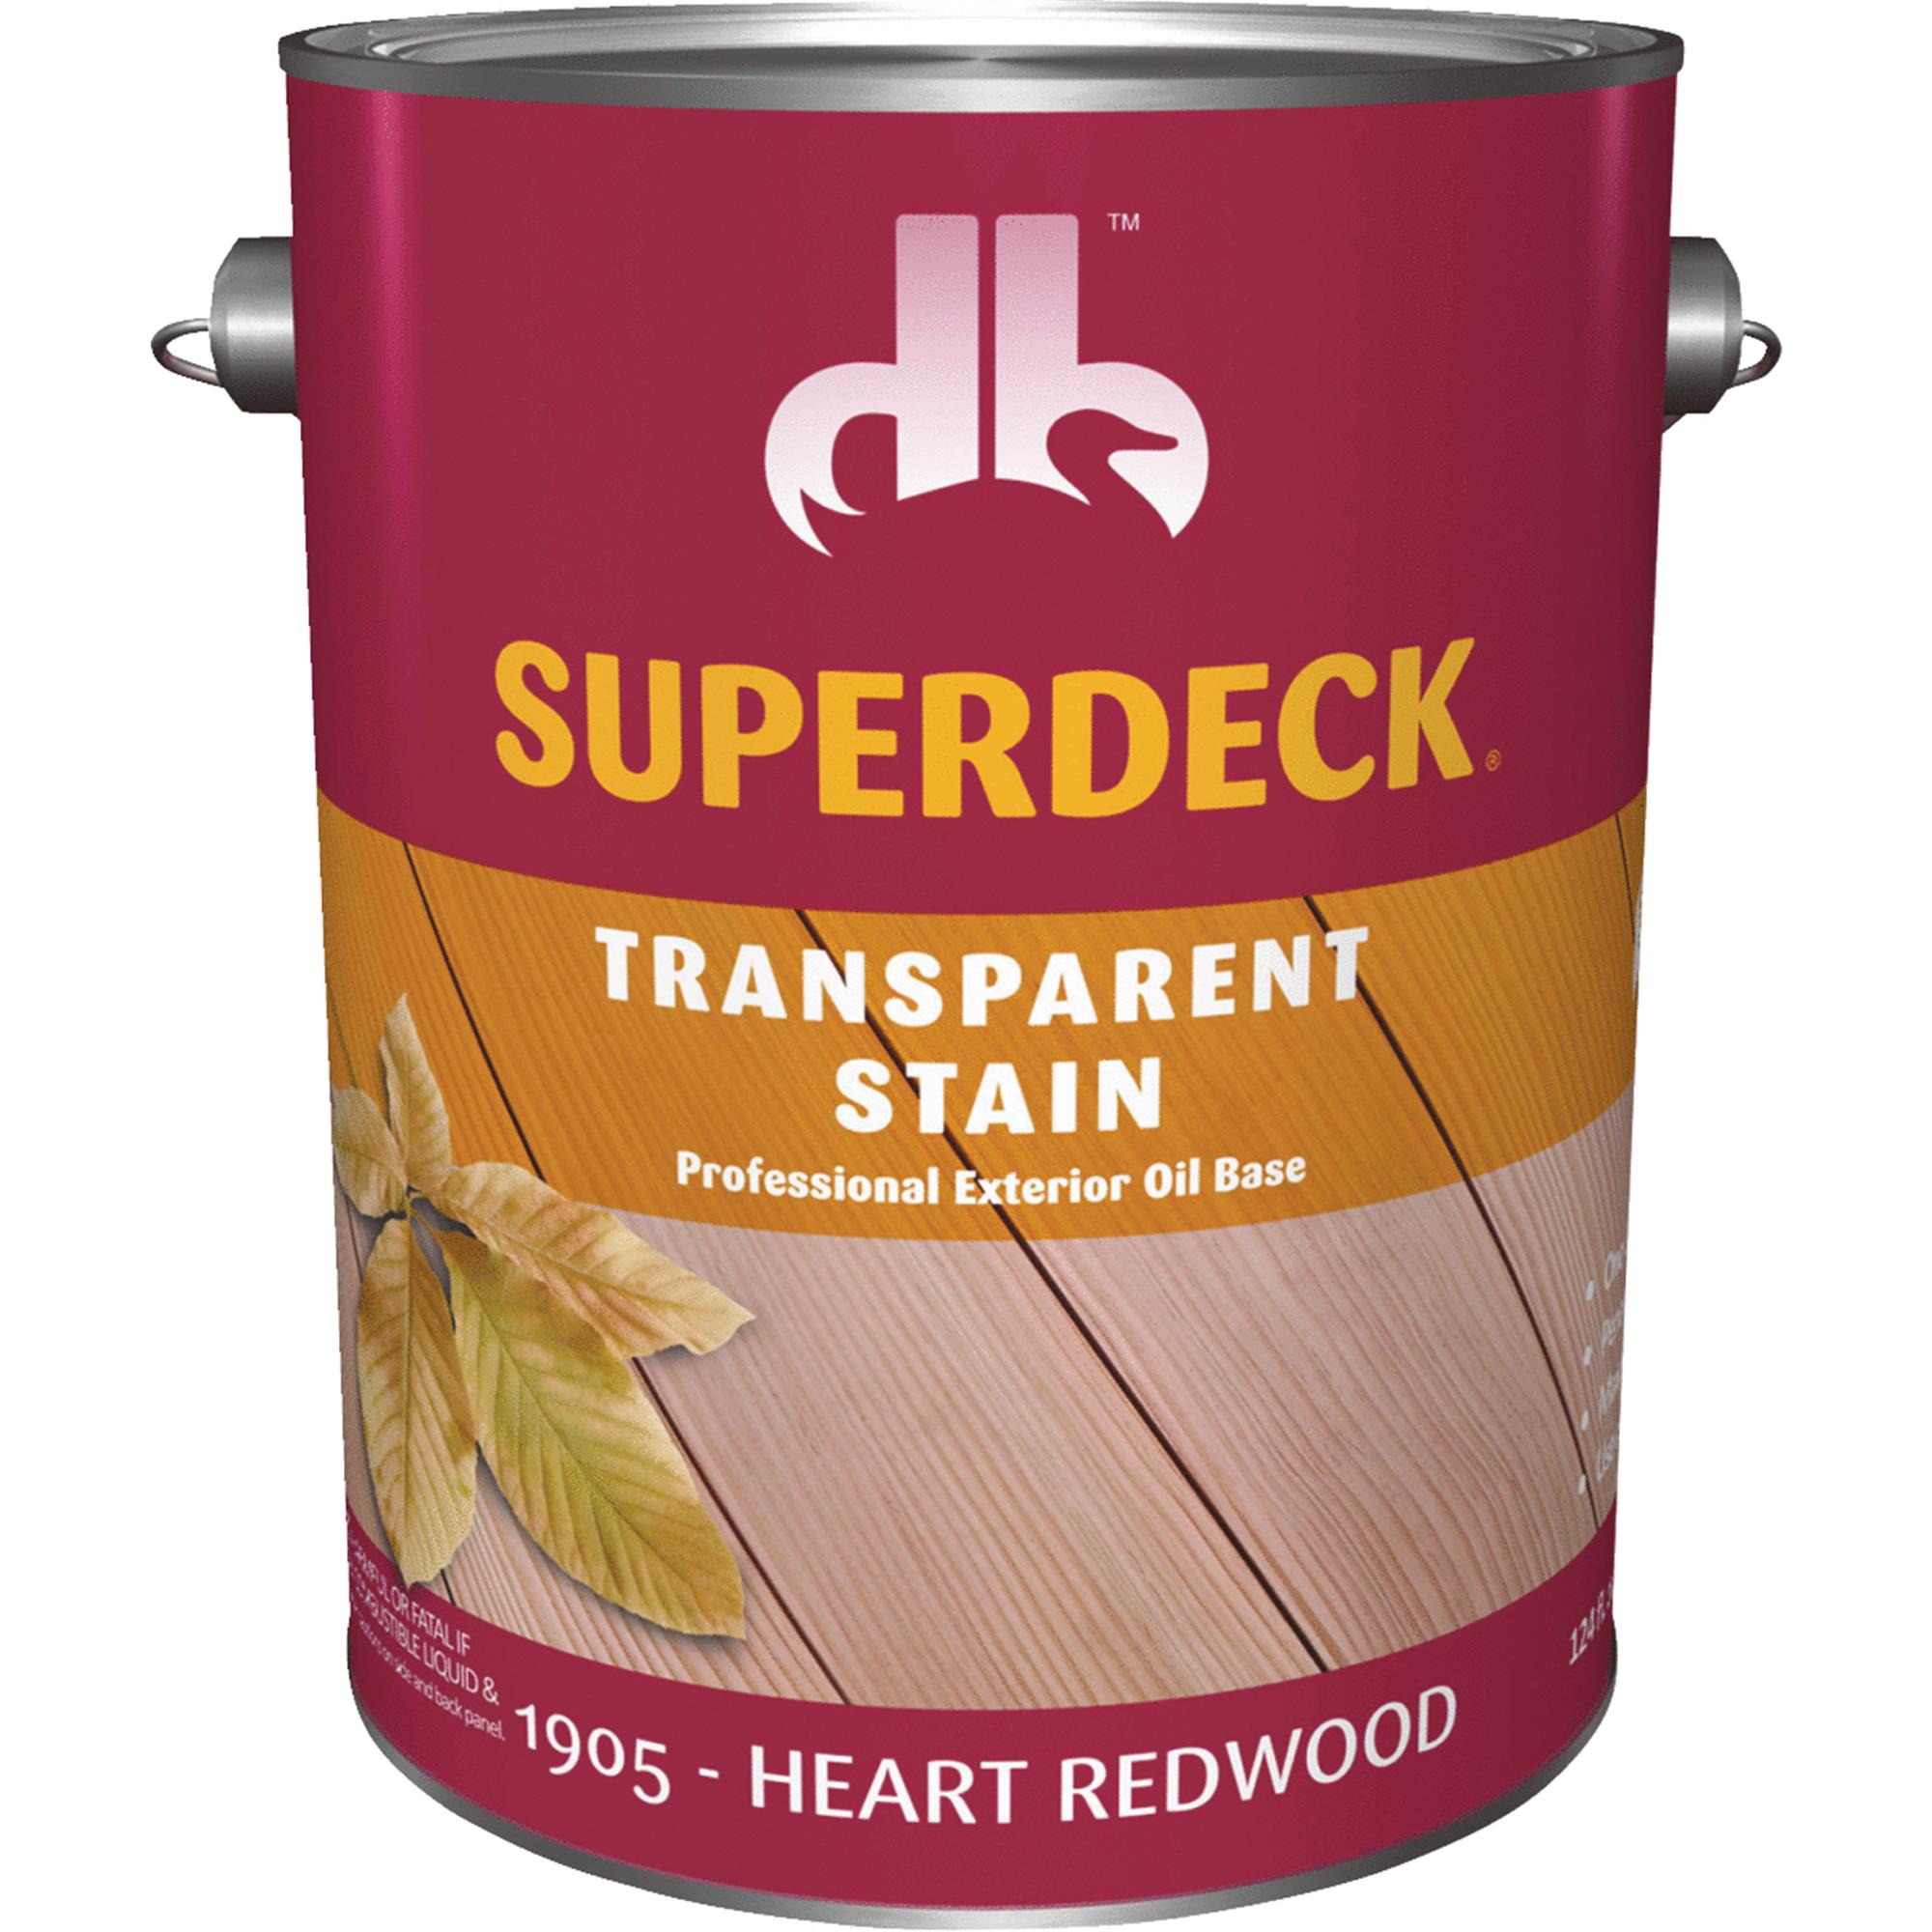 Duckback SUPERDECK Transparent Exterior Stain